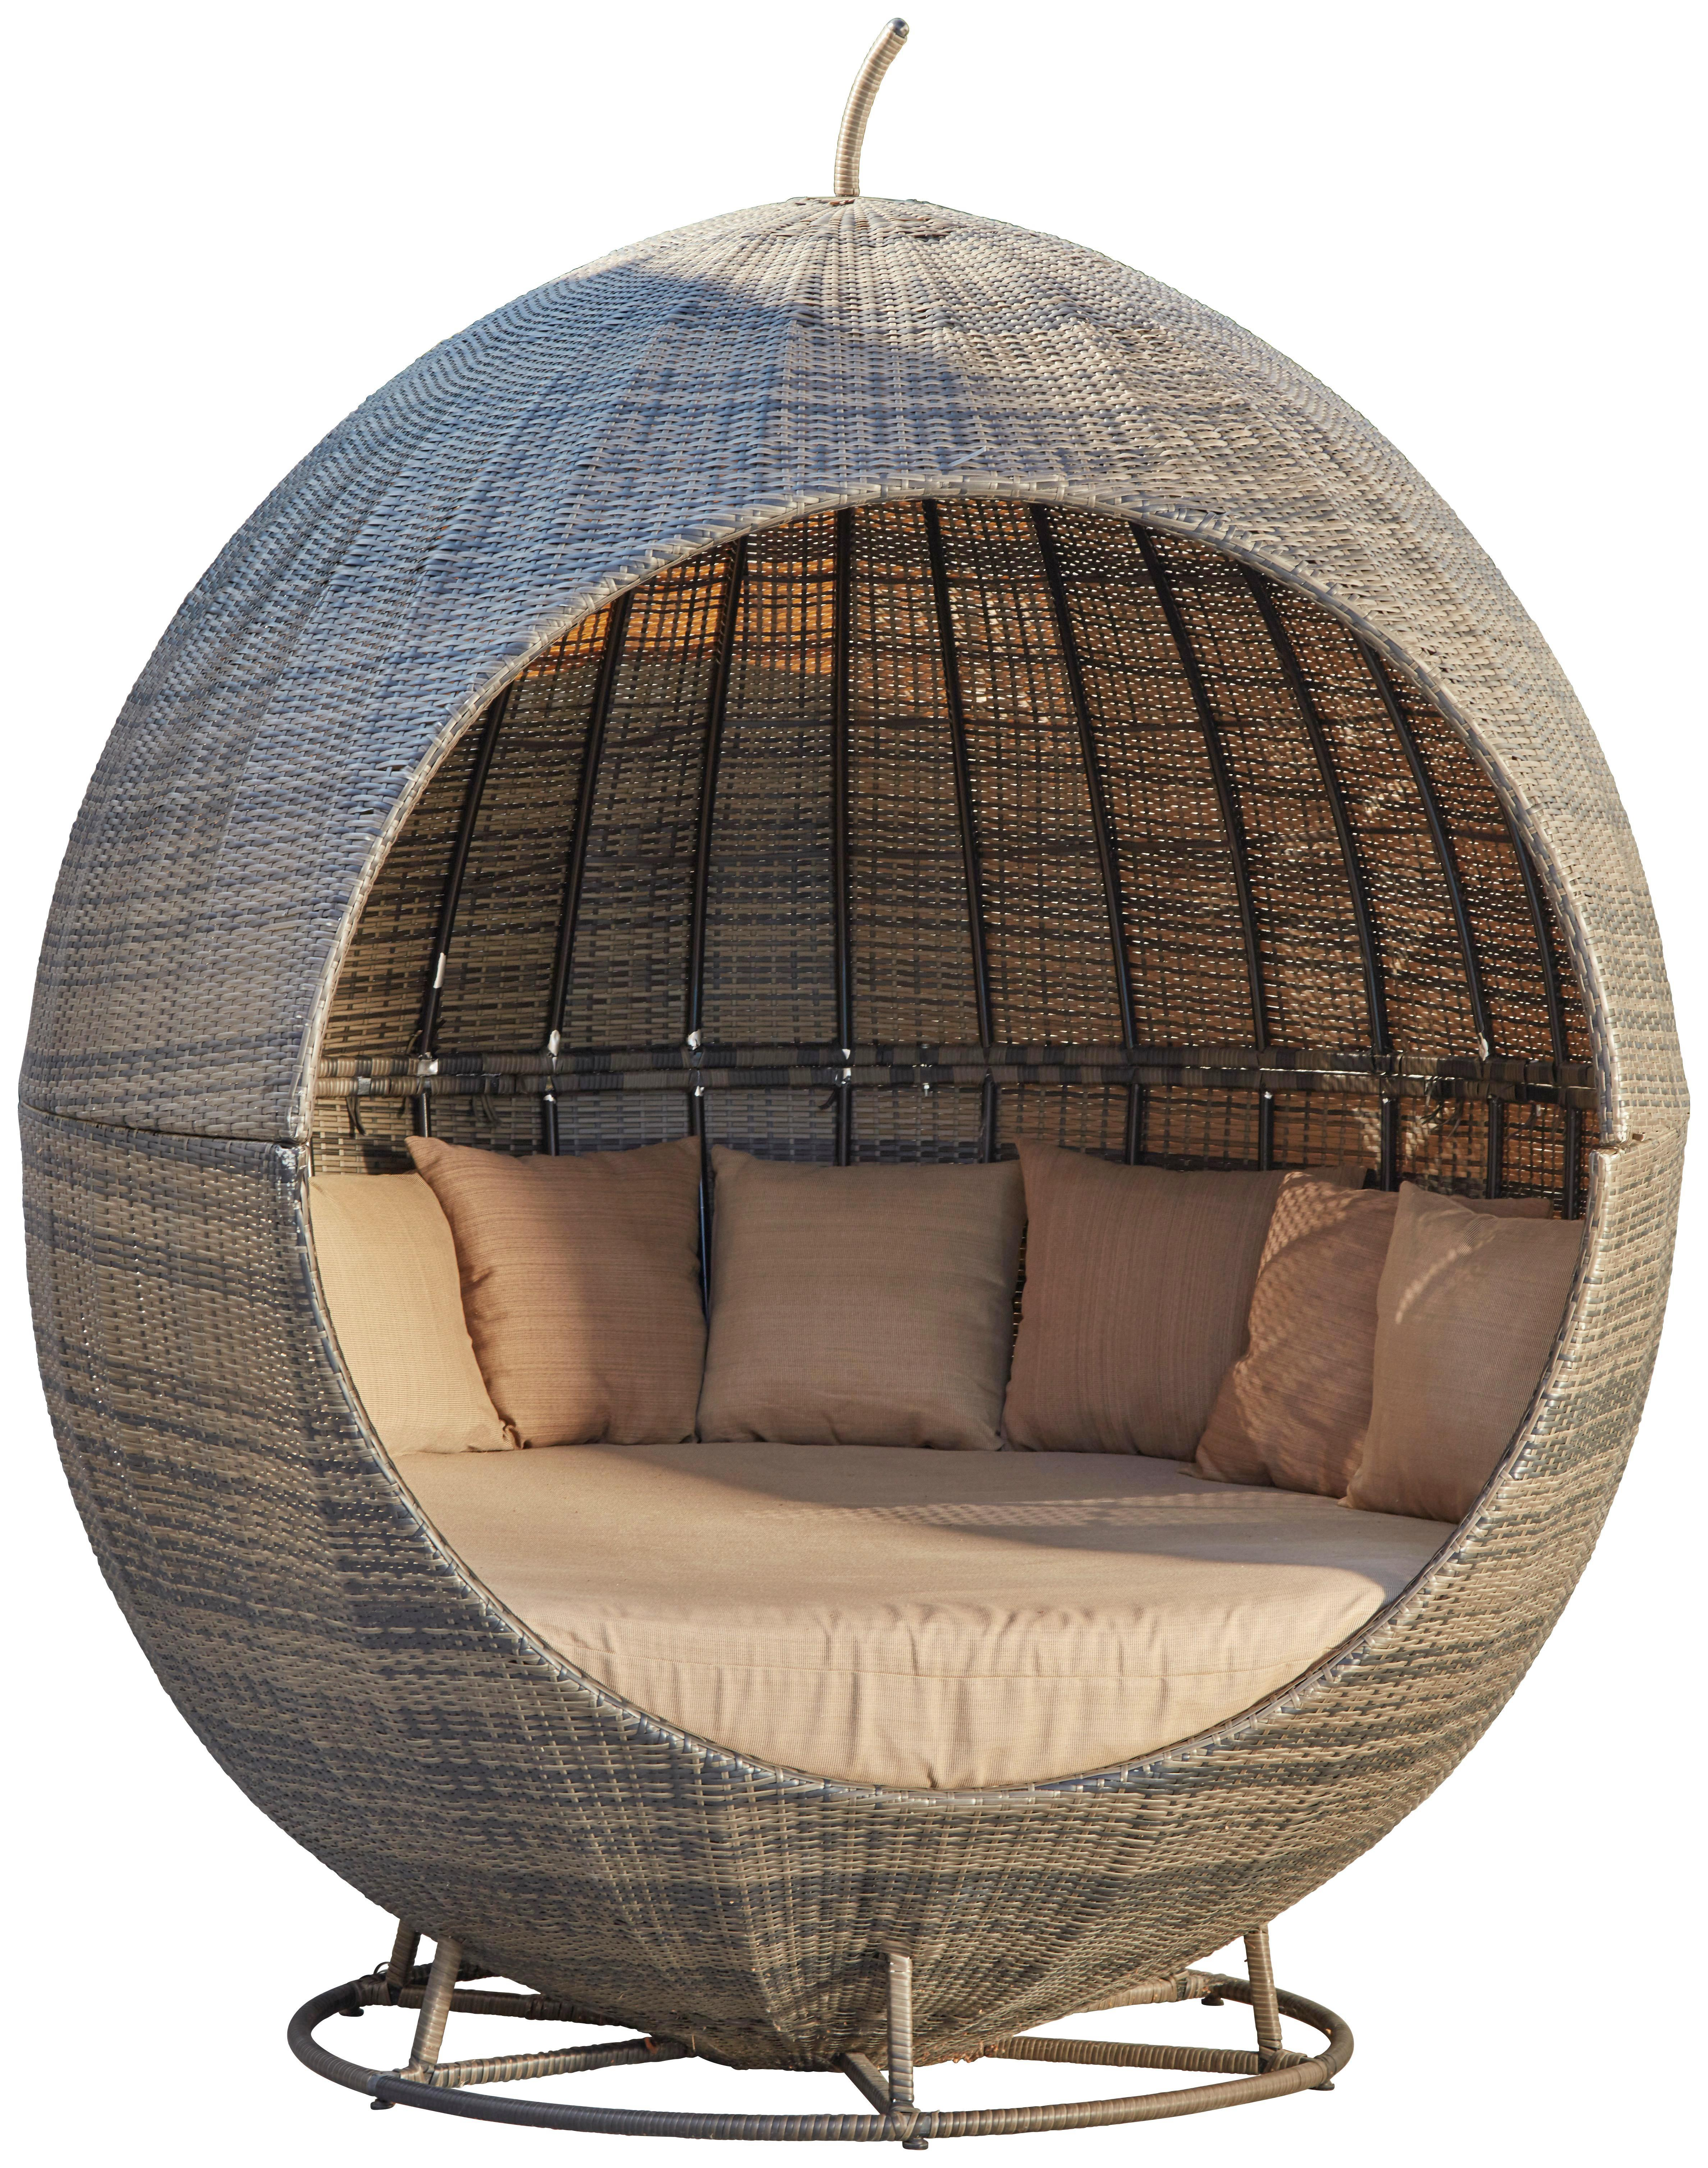 schutzhulle fur sonneninsel malerei. Black Bedroom Furniture Sets. Home Design Ideas